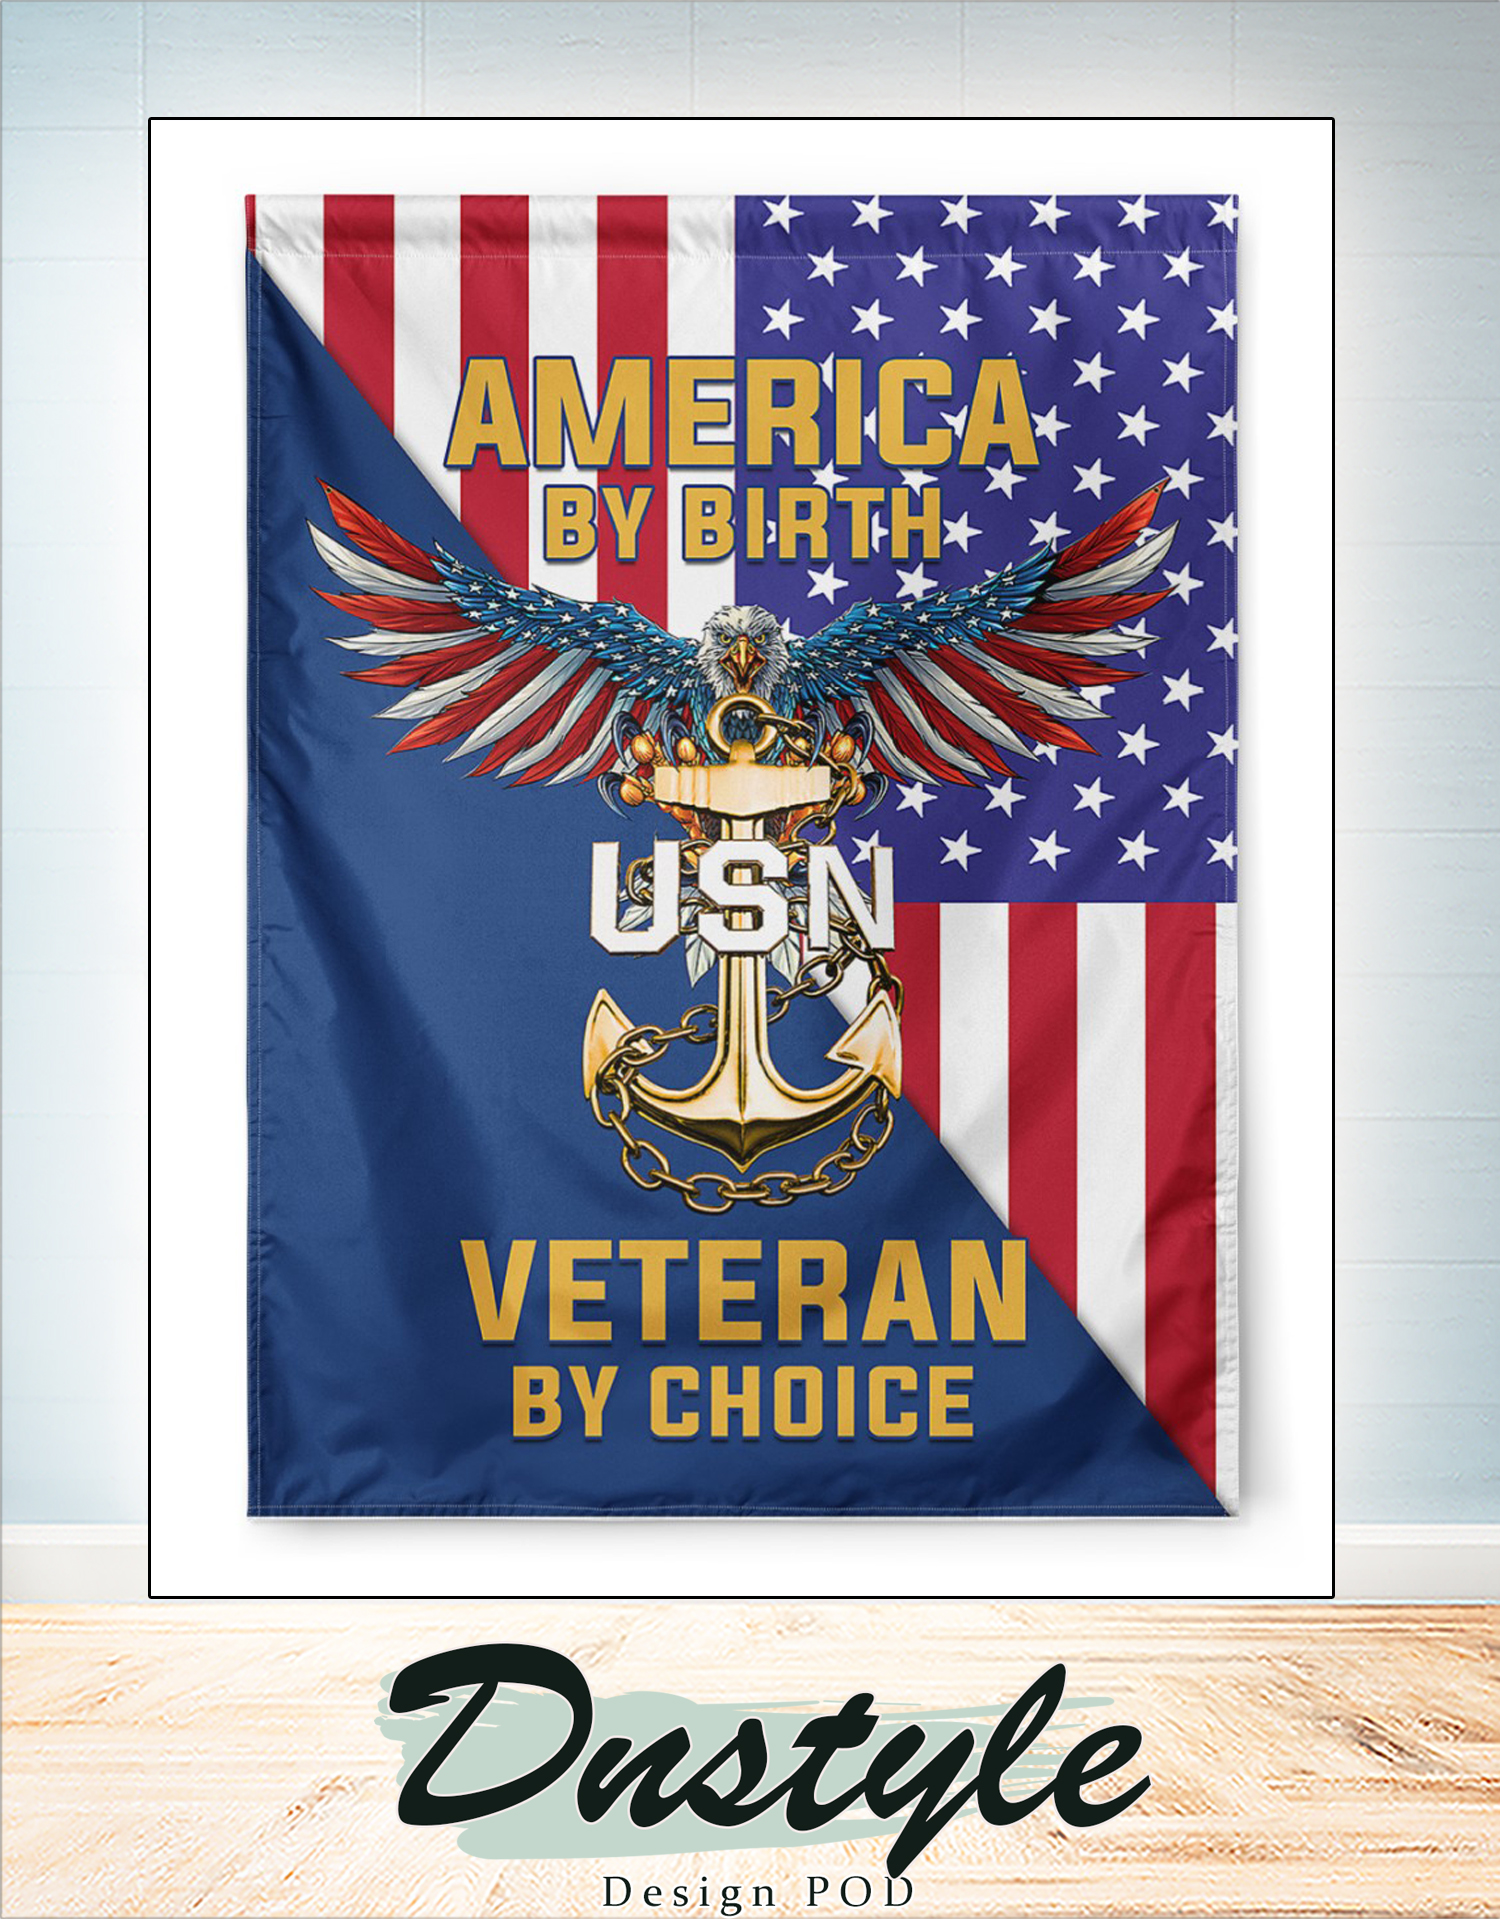 America by birth veteran by choice flag